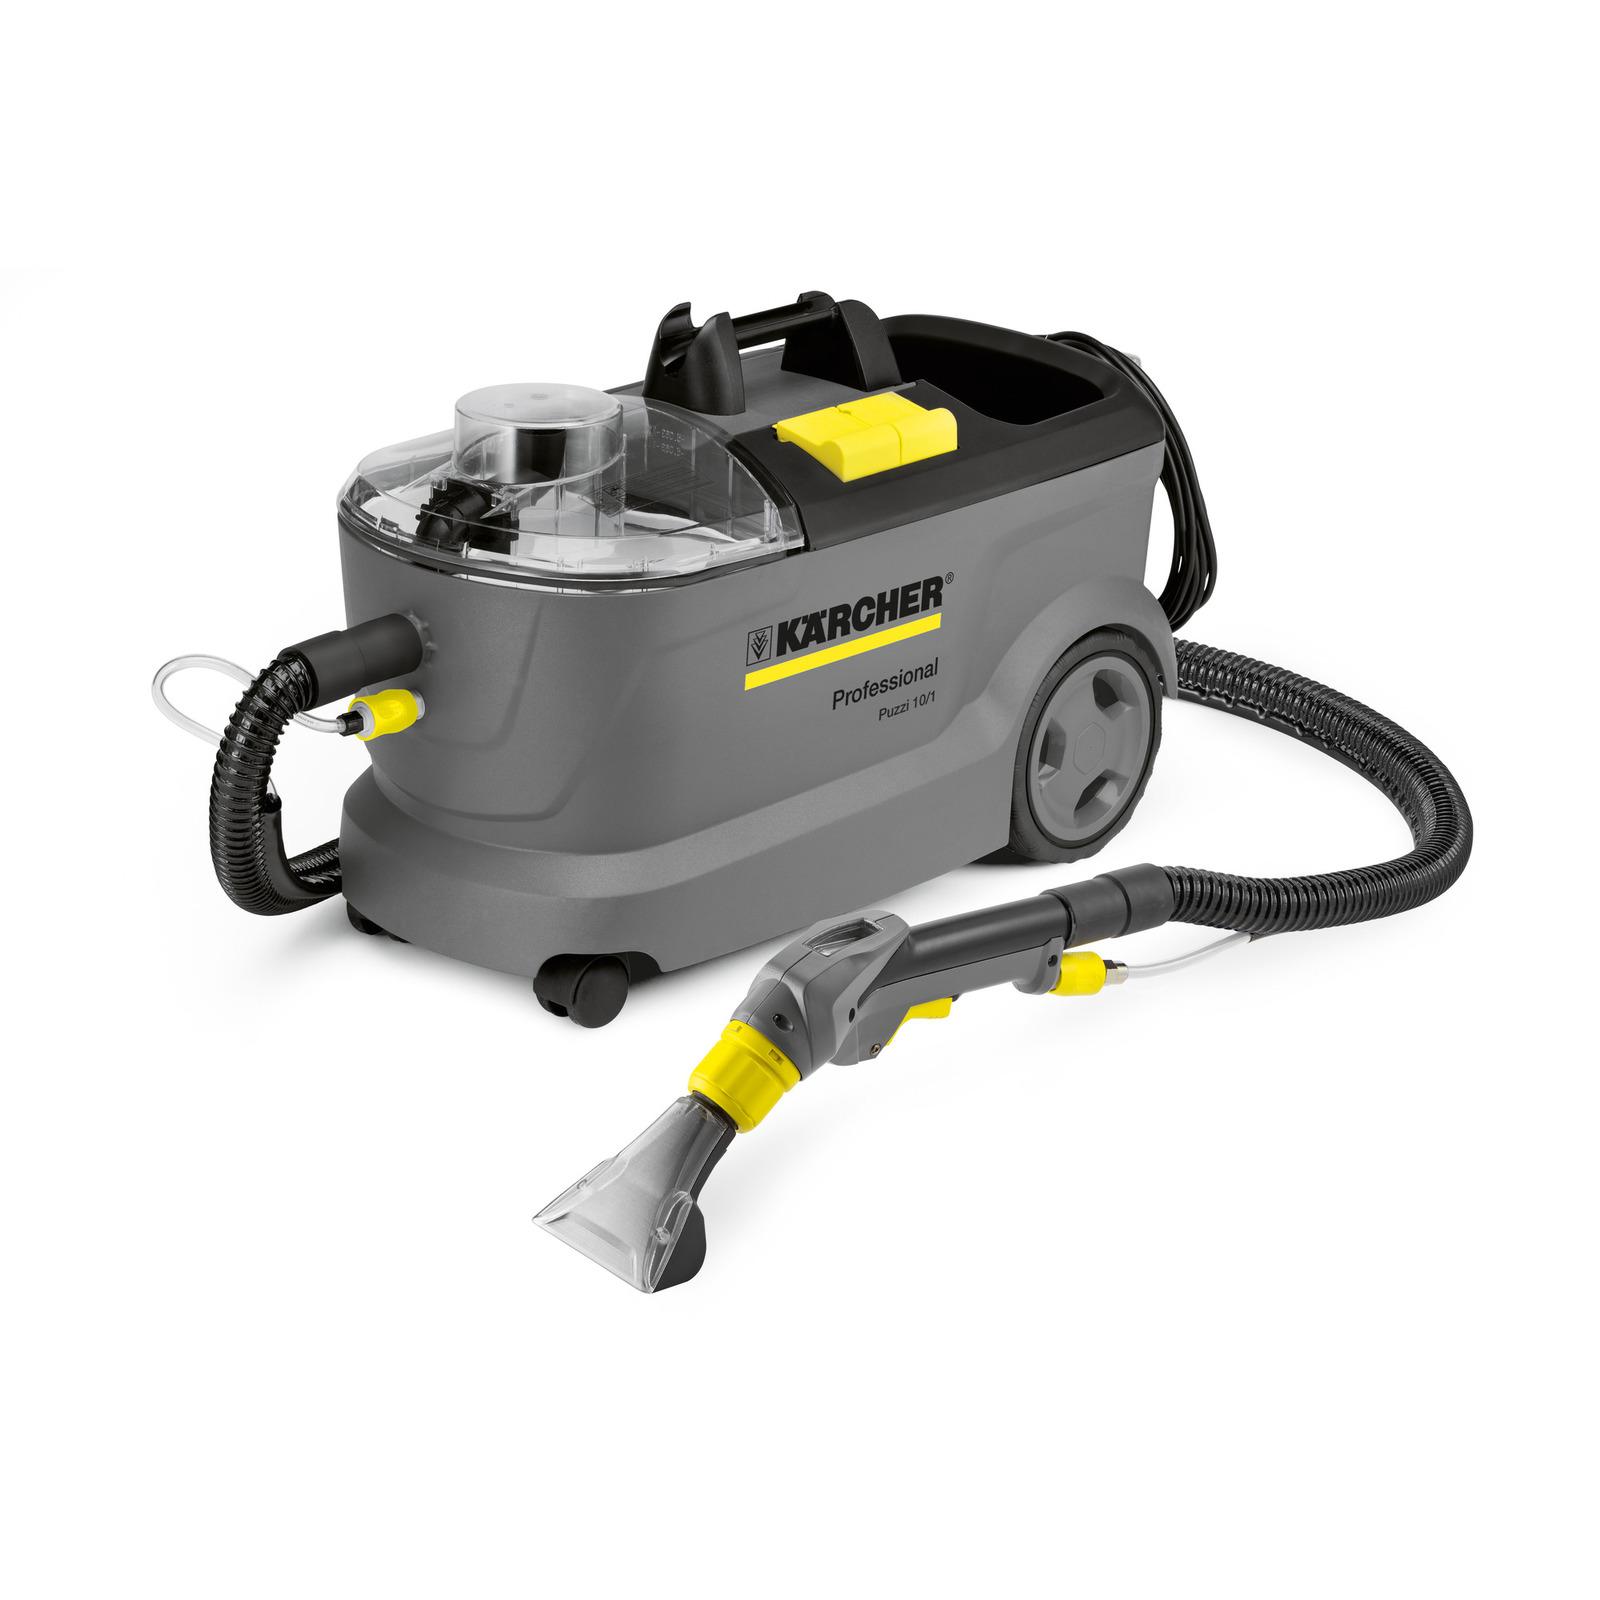 - Puzzi 10/1 Spray Extraction Cleaner